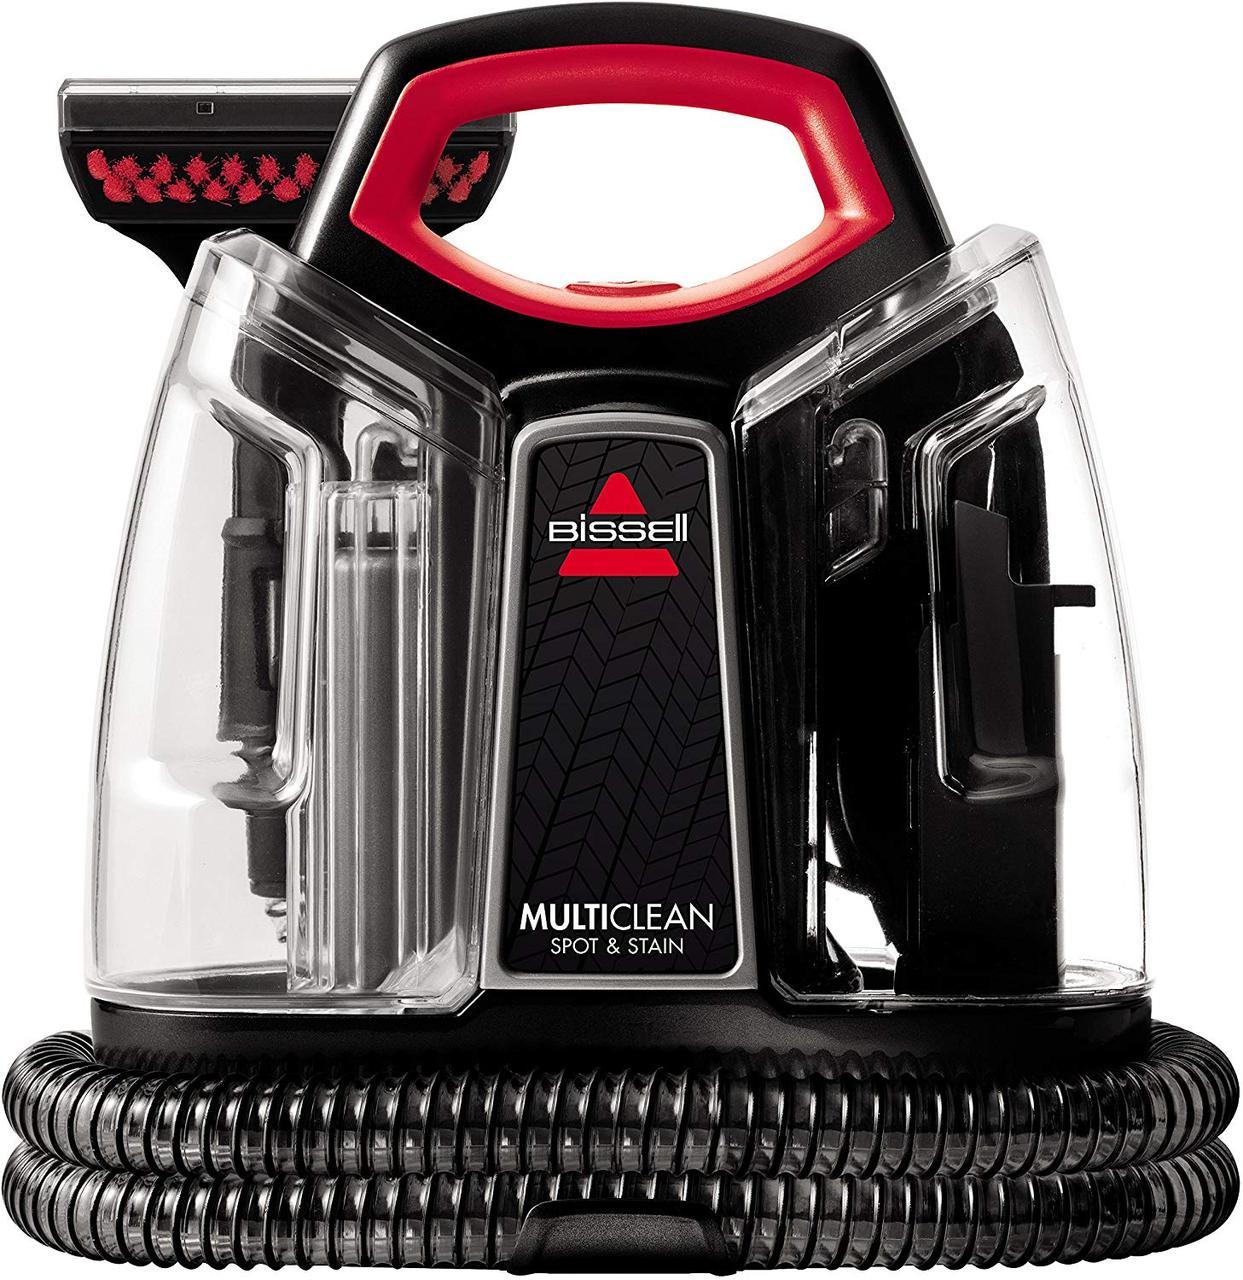 BISSELL MultiClean Spot & Stain  средство для чистки ковров и обивки